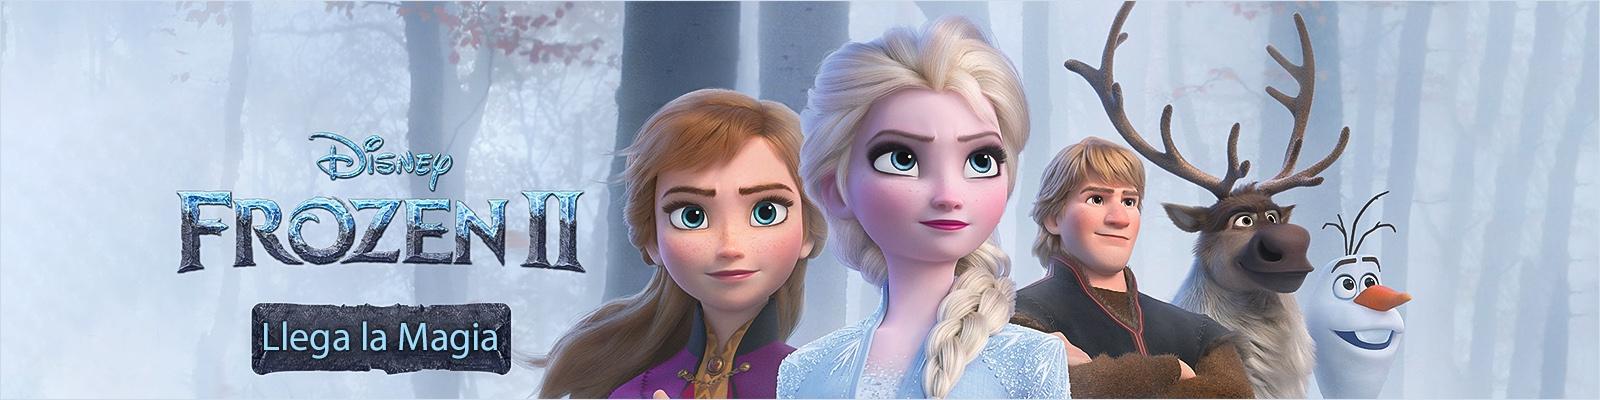 Comprar juguetes Frozen 2 online | Envios Gratis desde 49€